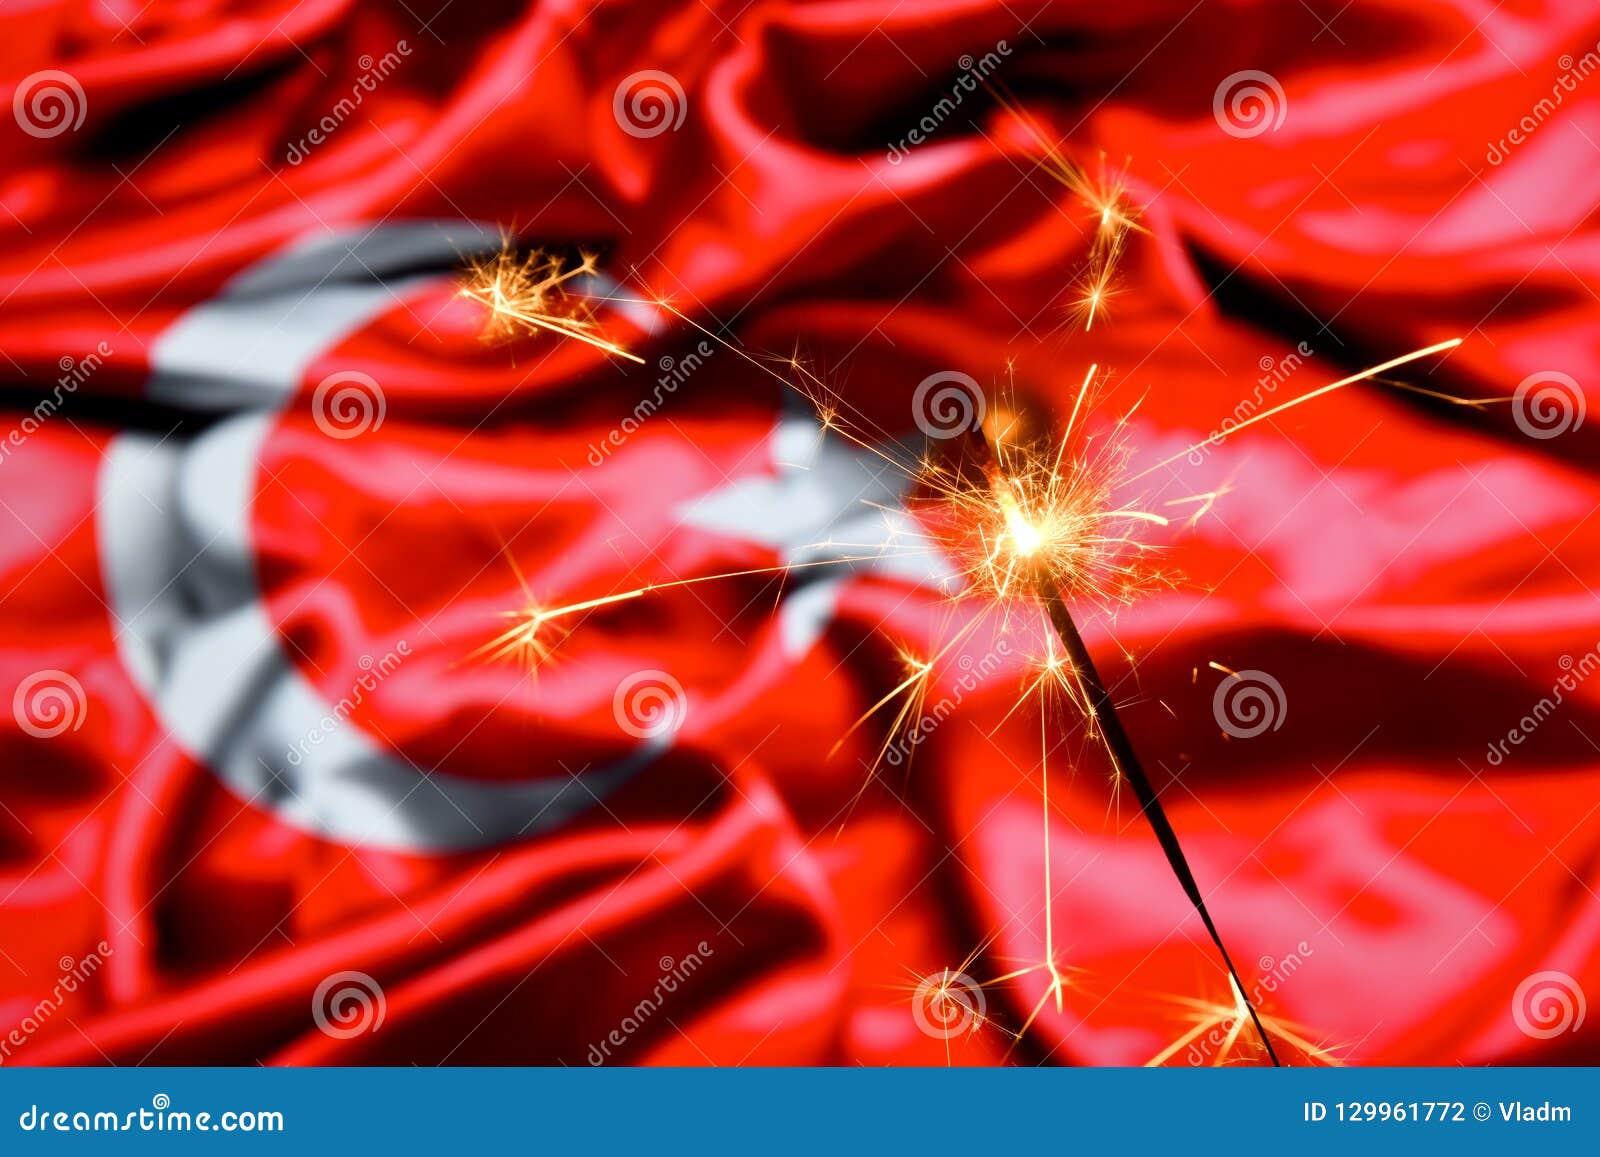 Close up of sparkler burning over Turkey, Turkish flag. Holidays, celebration, party concept.